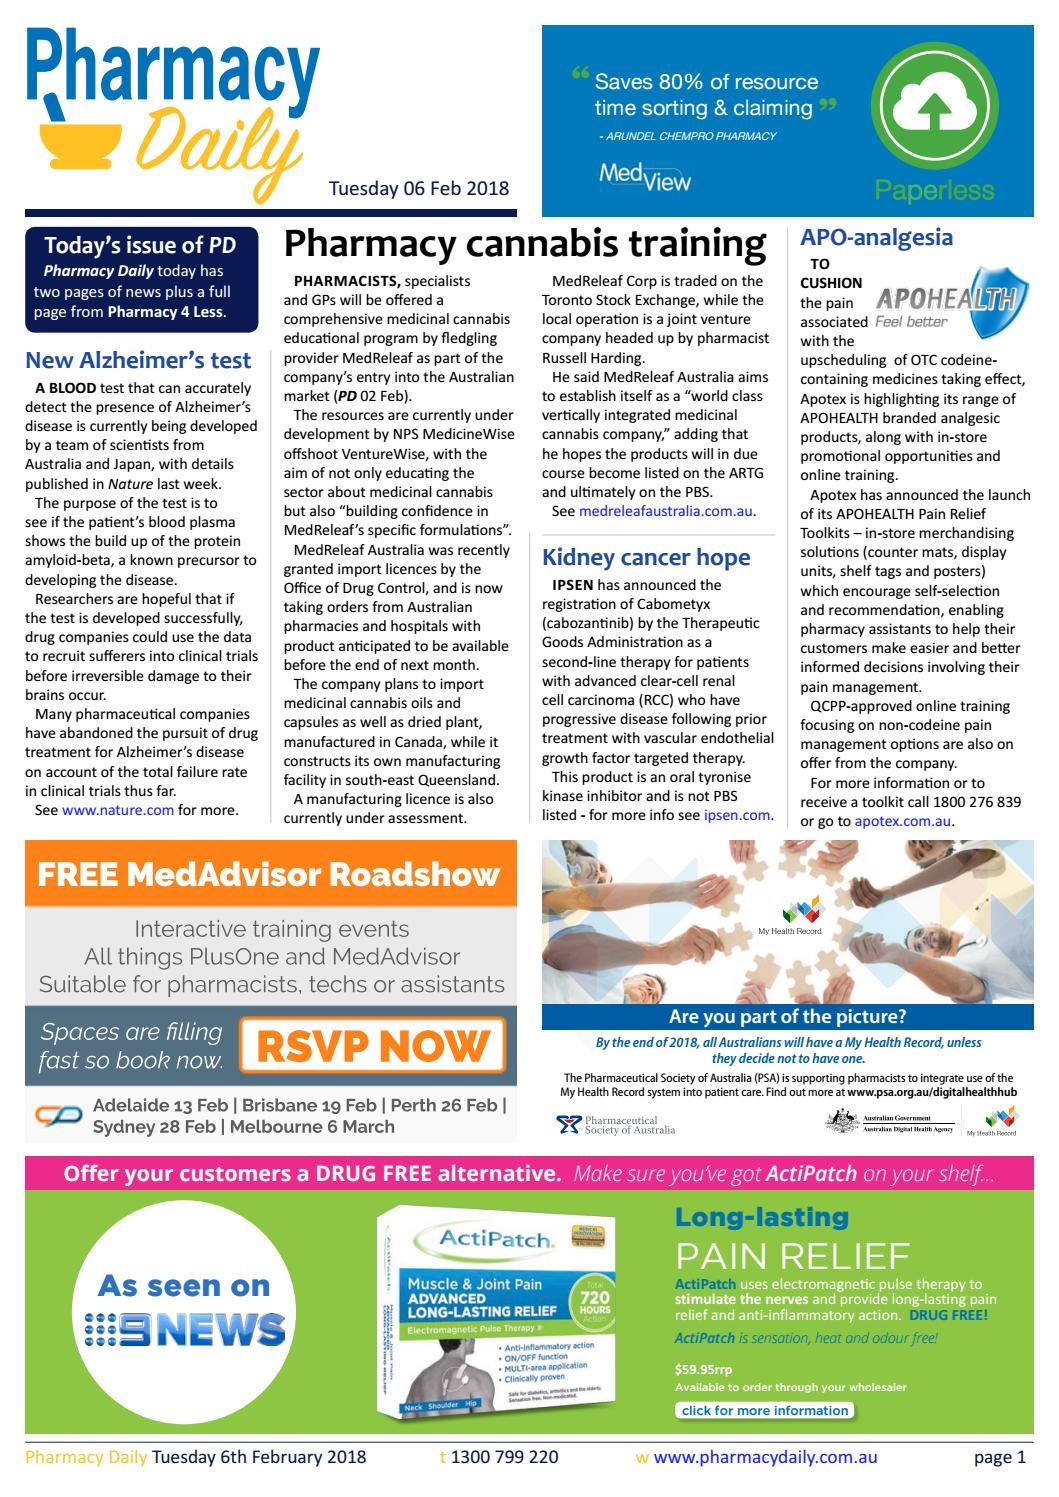 PD for Tue 06 Feb 2018 - Pharmacy cannabis training, Apotex